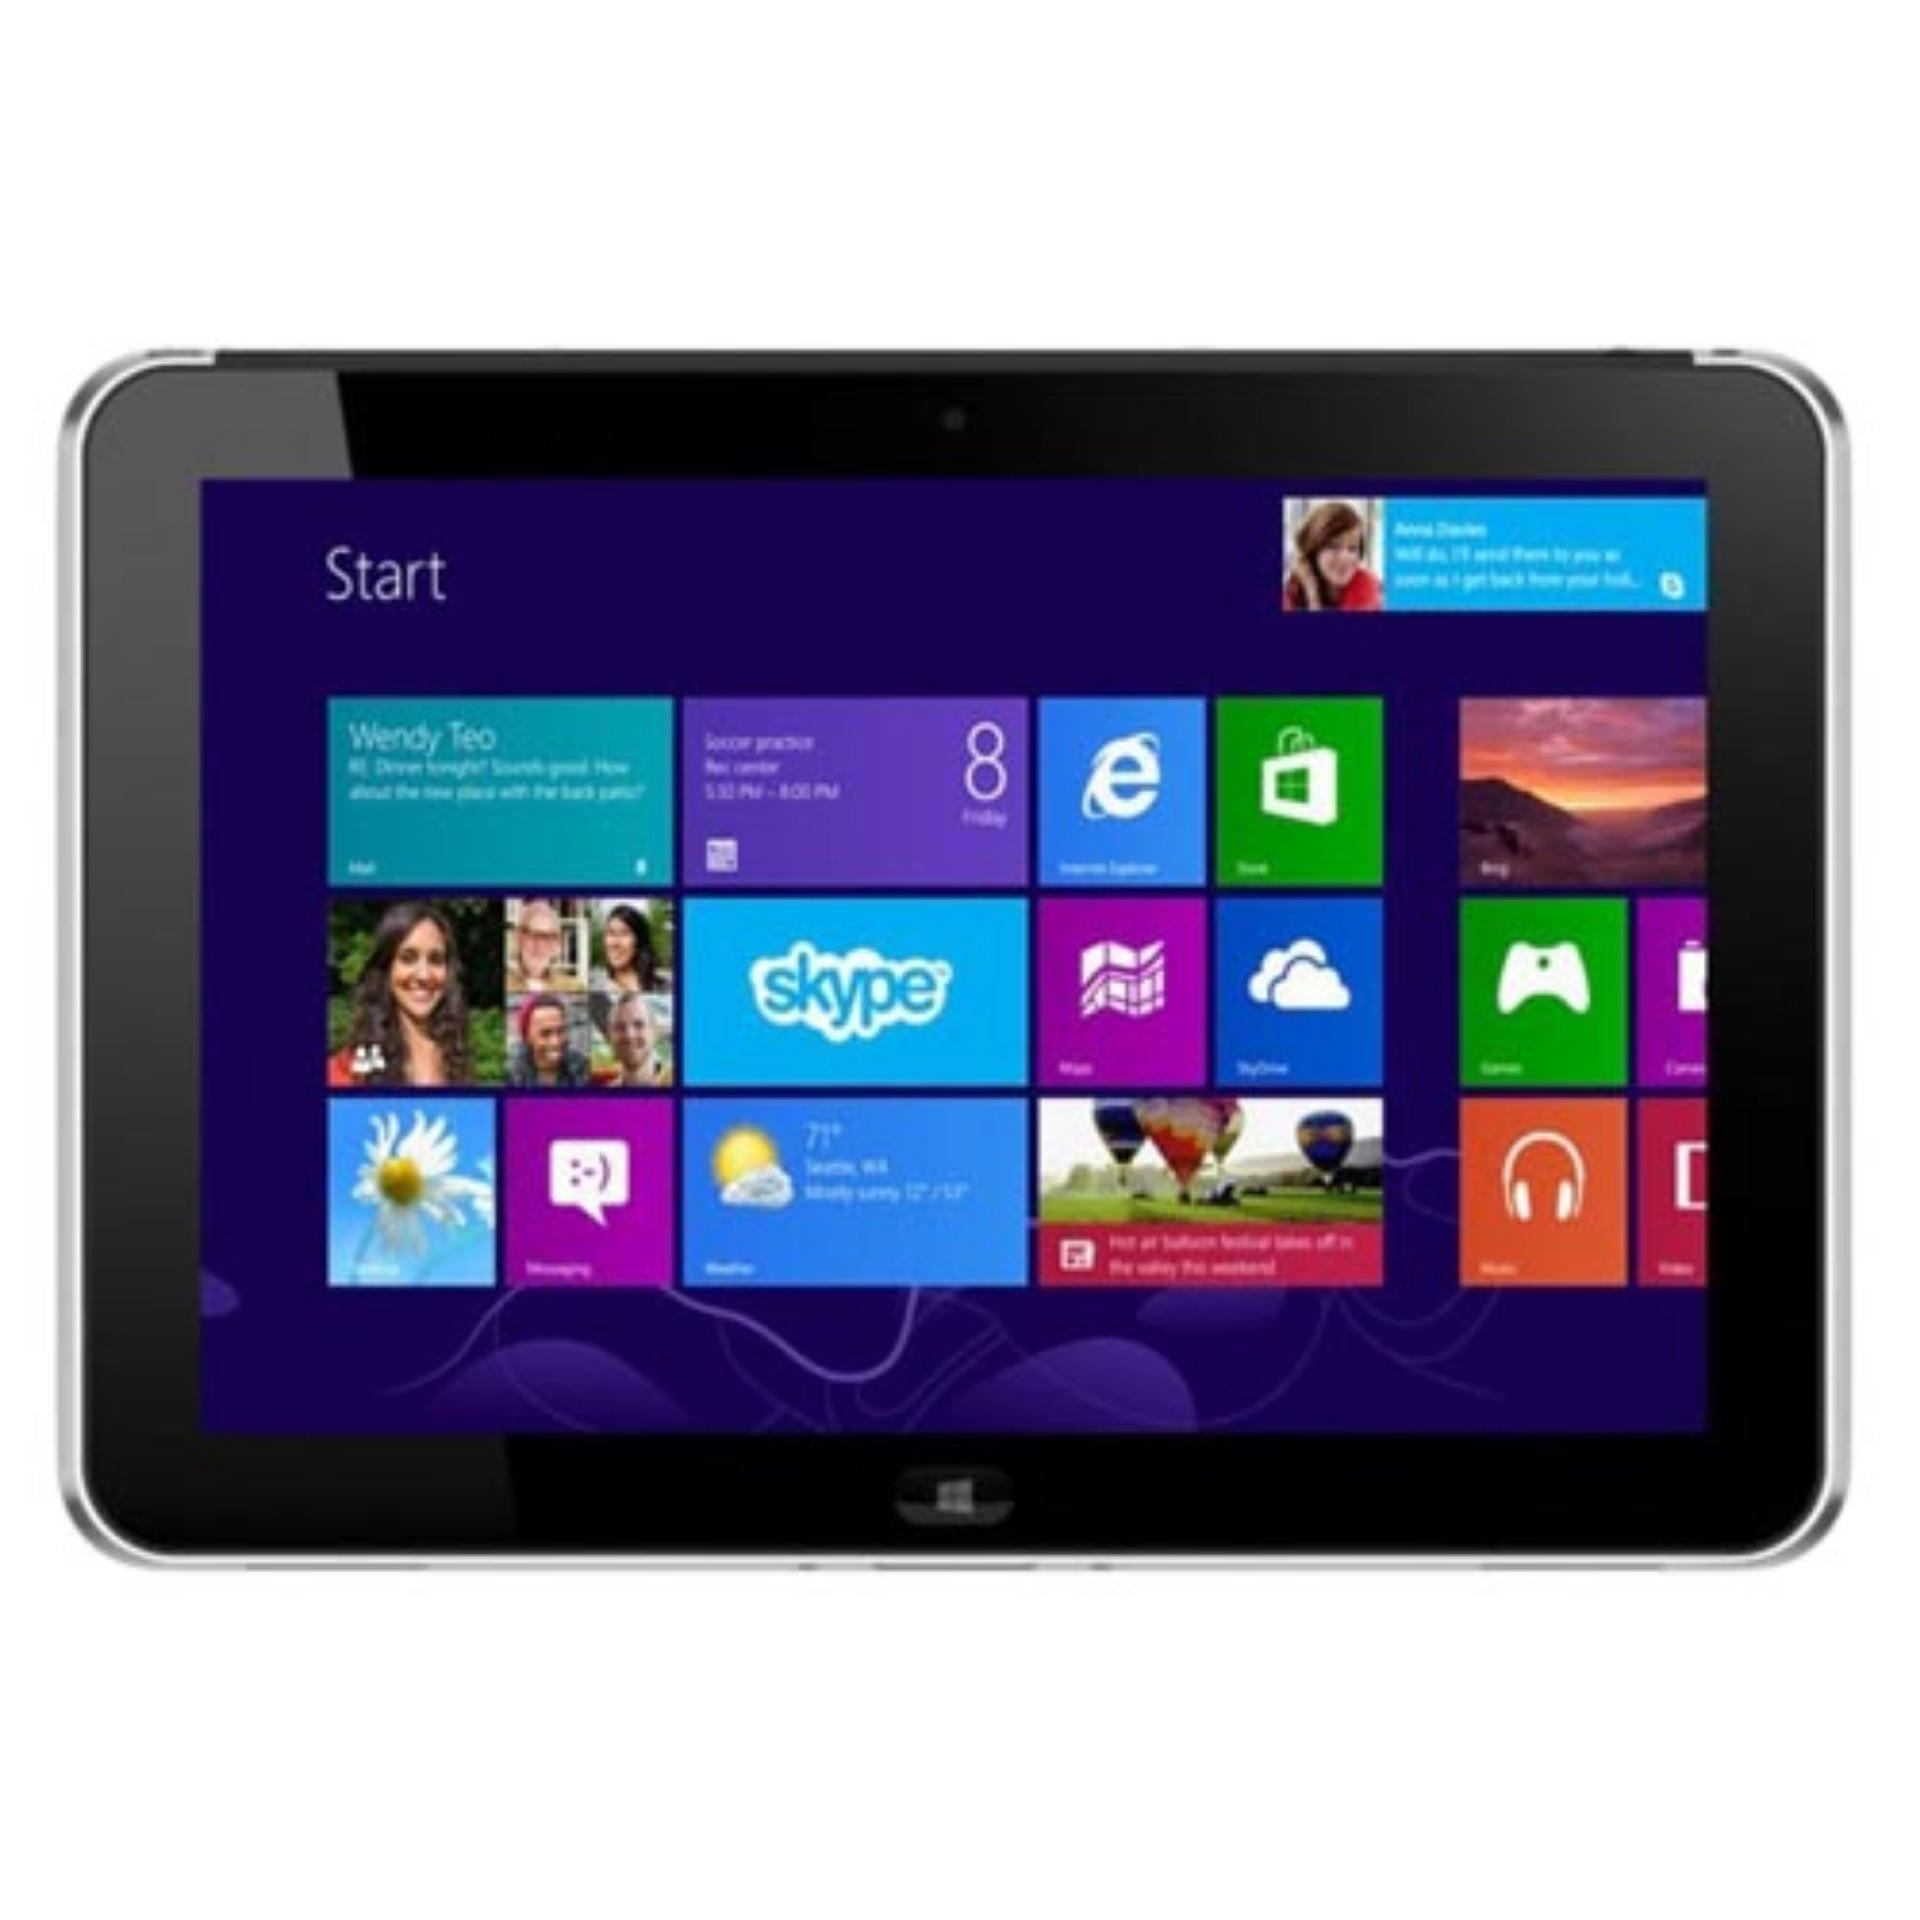 (REFURBISHED) HP ElitePad 900 G1 – 10.1″ – Atom Z2760 – 2 GB RAM – 32 GB SSD – Windows 8.1